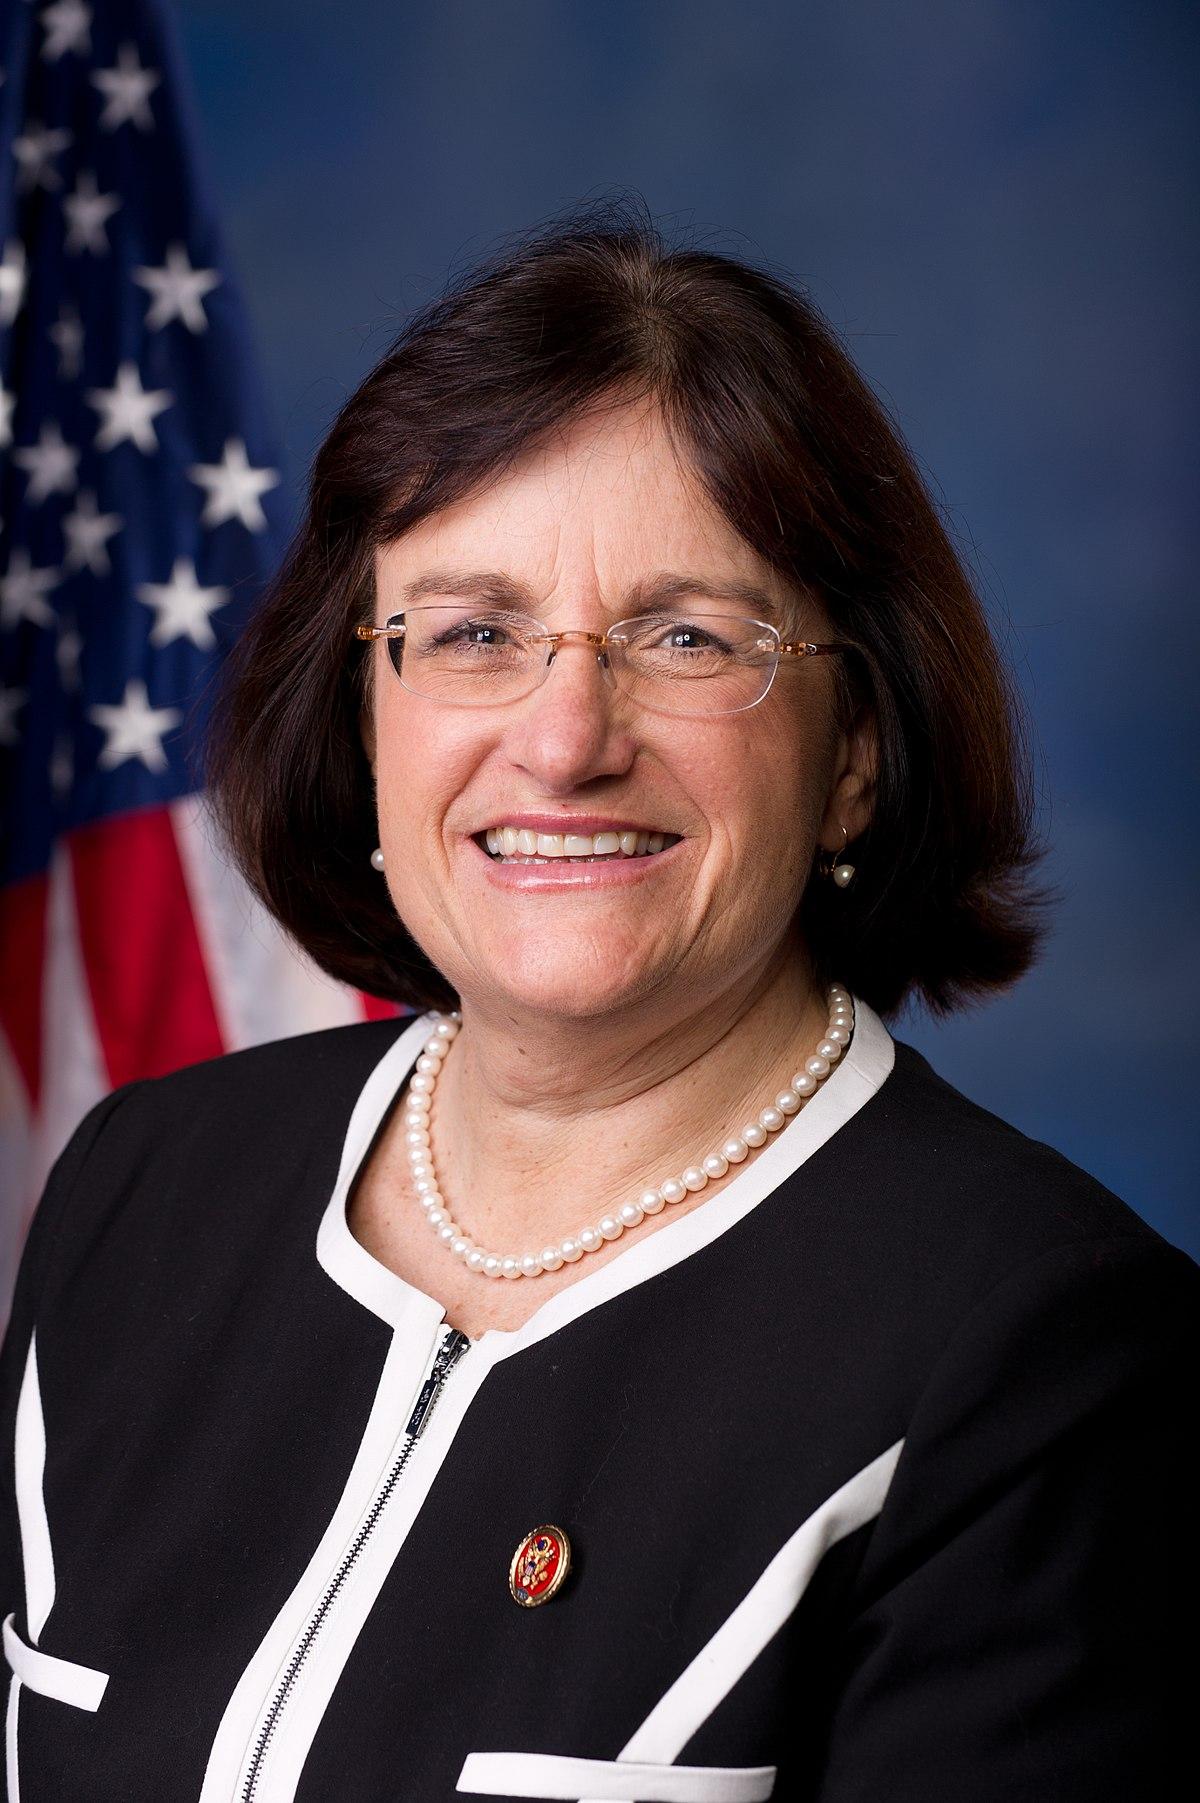 Rep. Annie Kuster (D-NH-2)